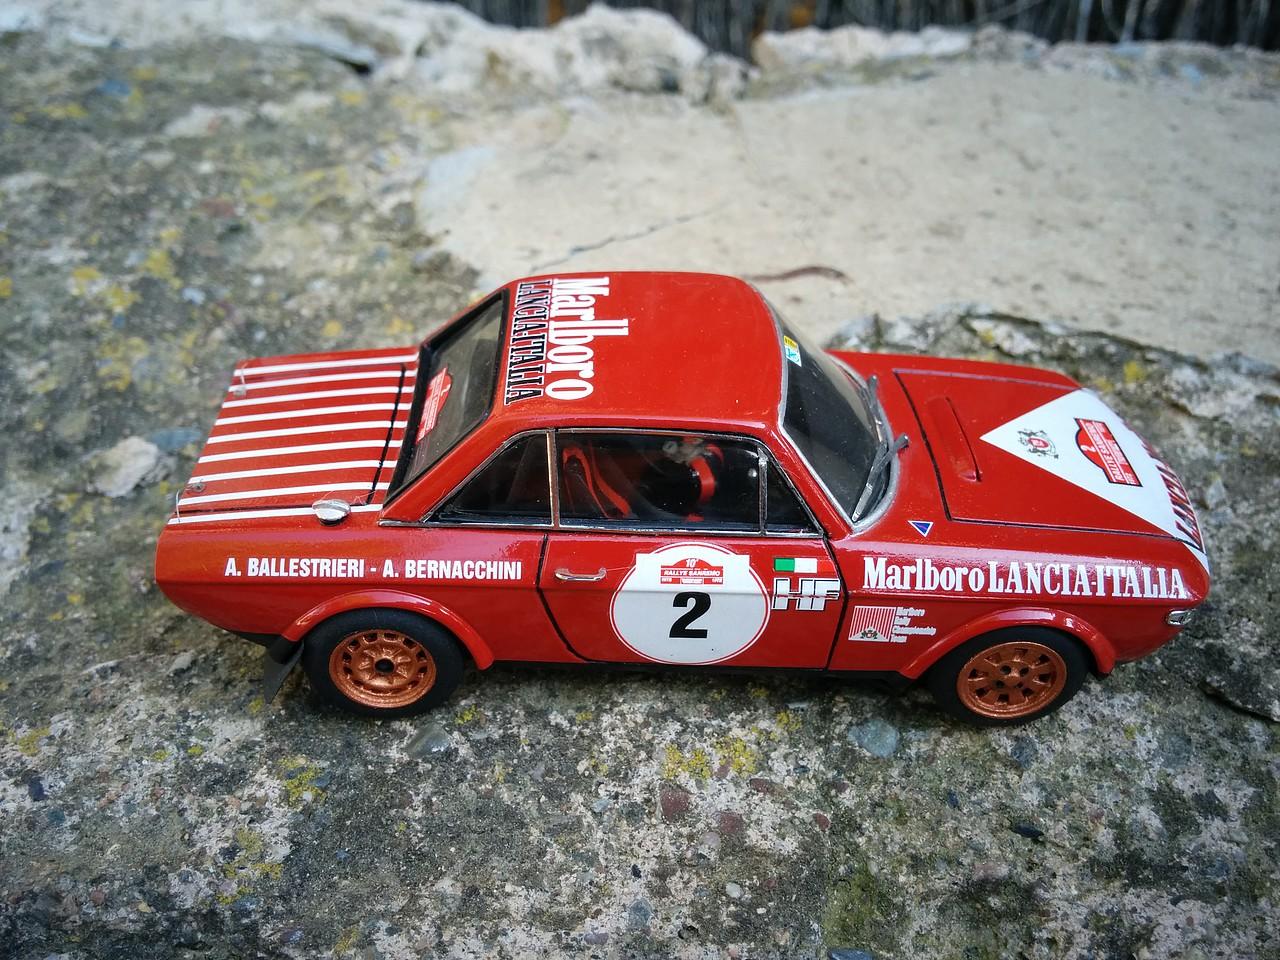 Lancia Fulvia San Remo 72. Racing 43 a escala 1/43 2F540004BE3E5372039F3653720385